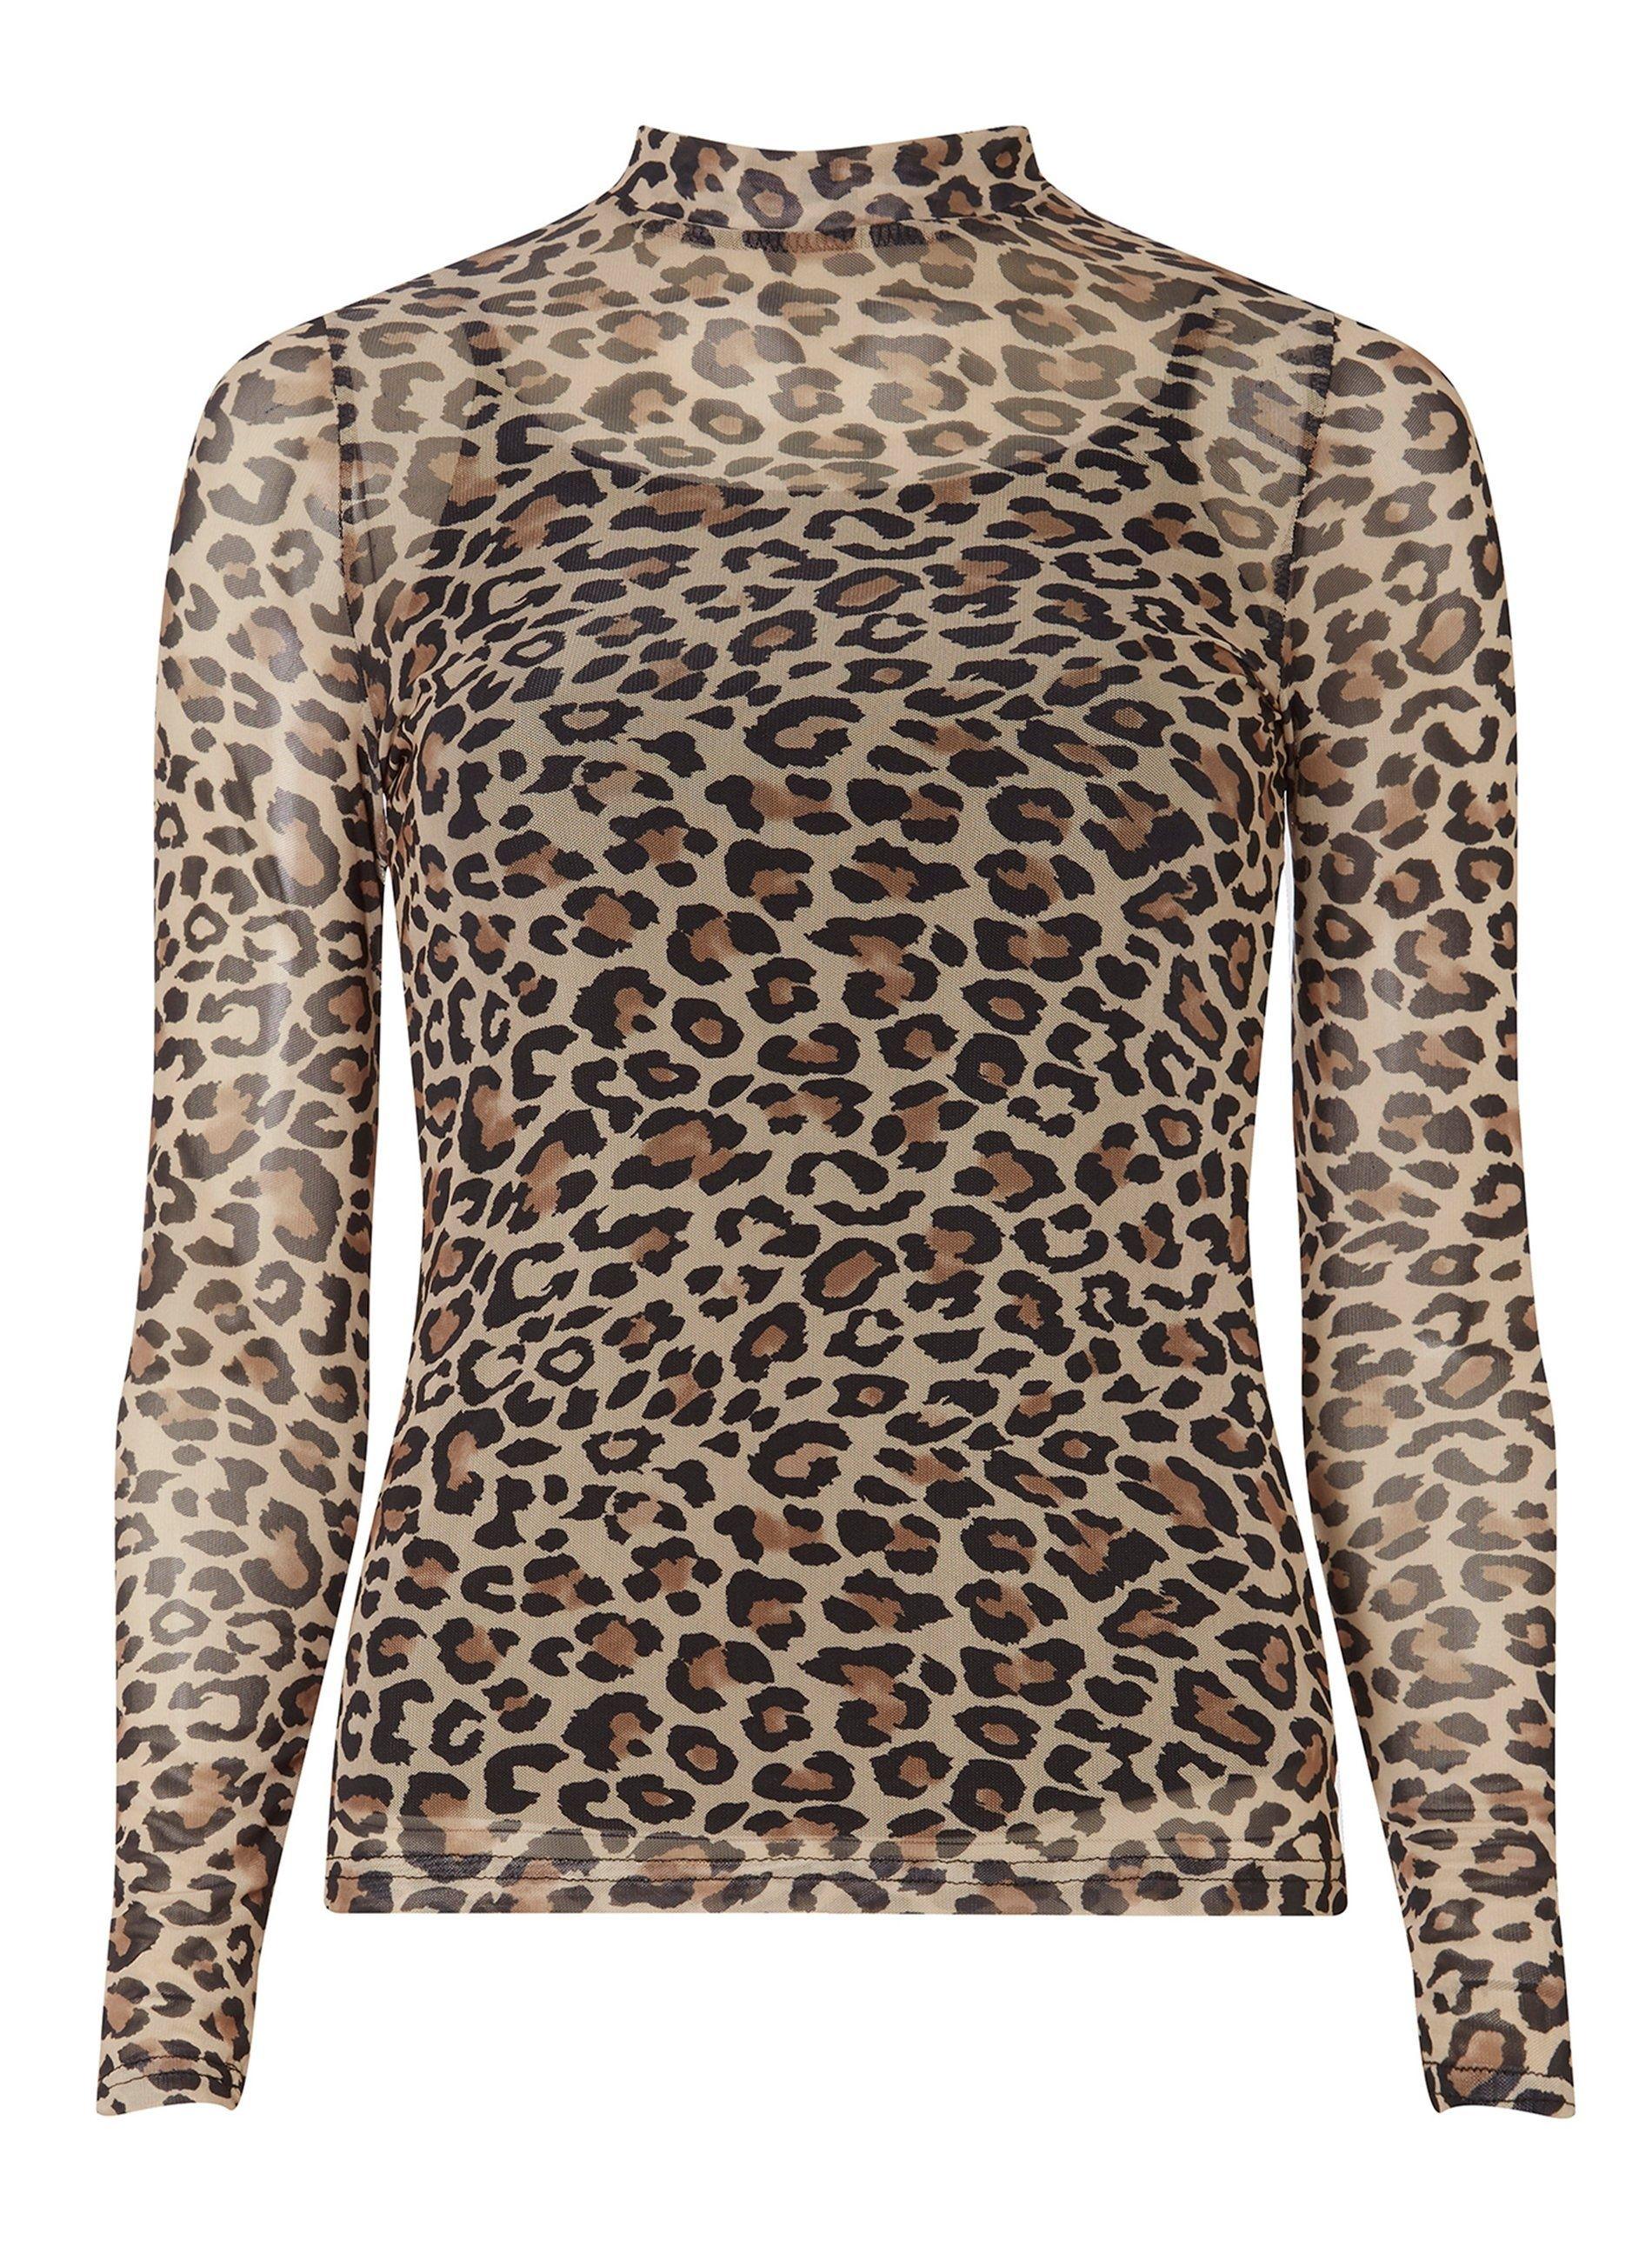 99d49858a613 Leopard Print Mesh Top in 2019 | My Designs! | Tops, Cheetah print ...